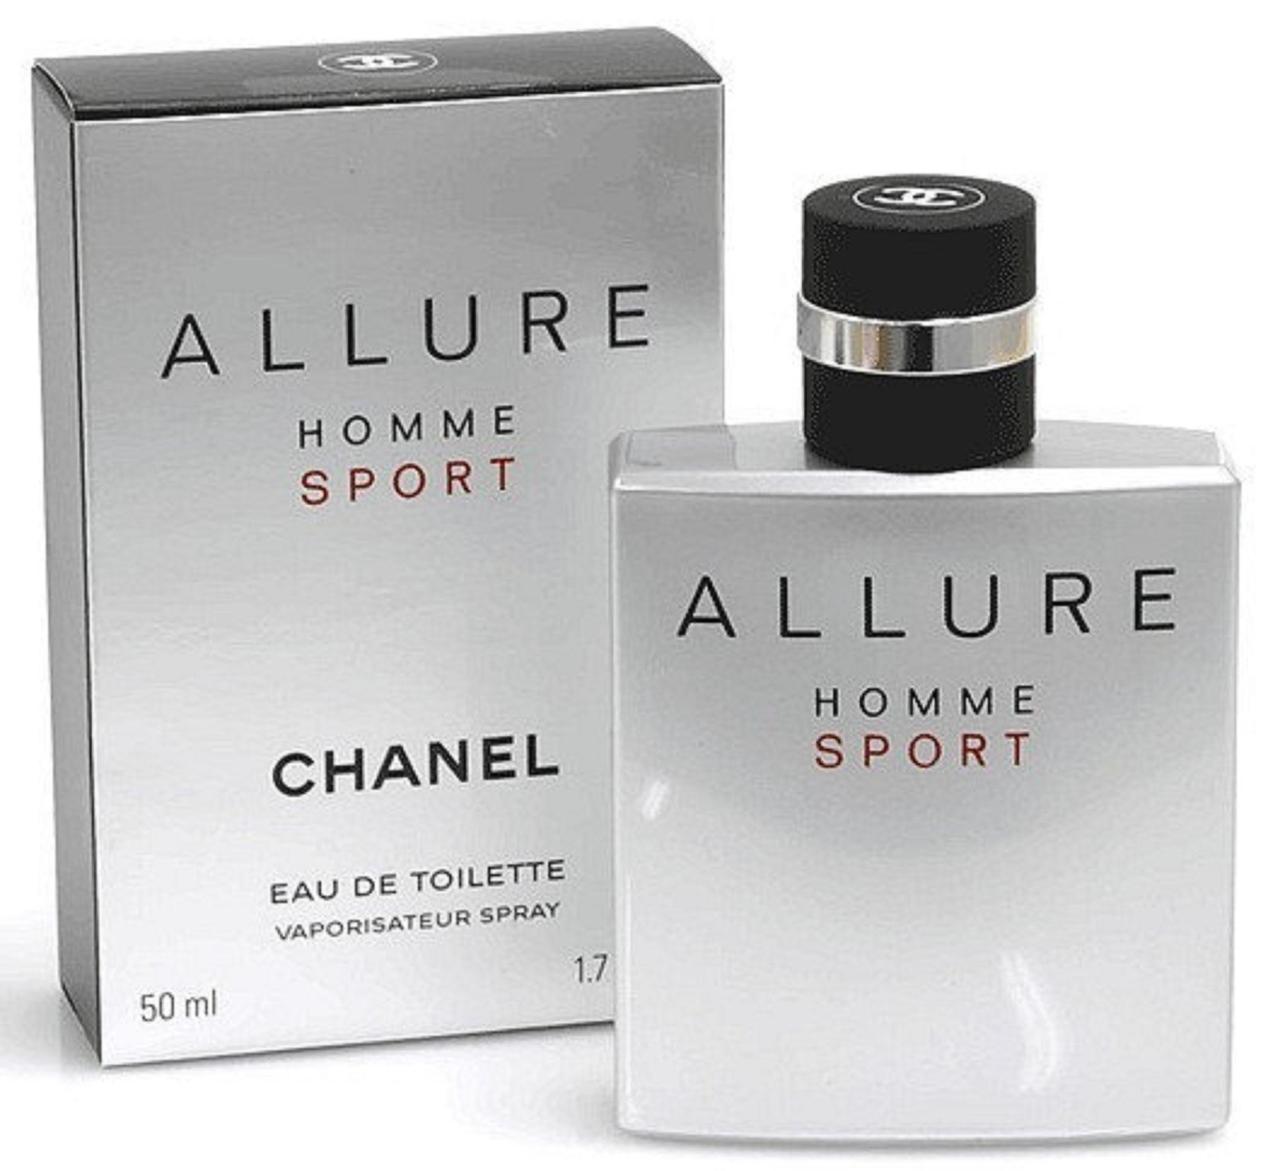 Мужской аромат Allure Homme Sport реплика